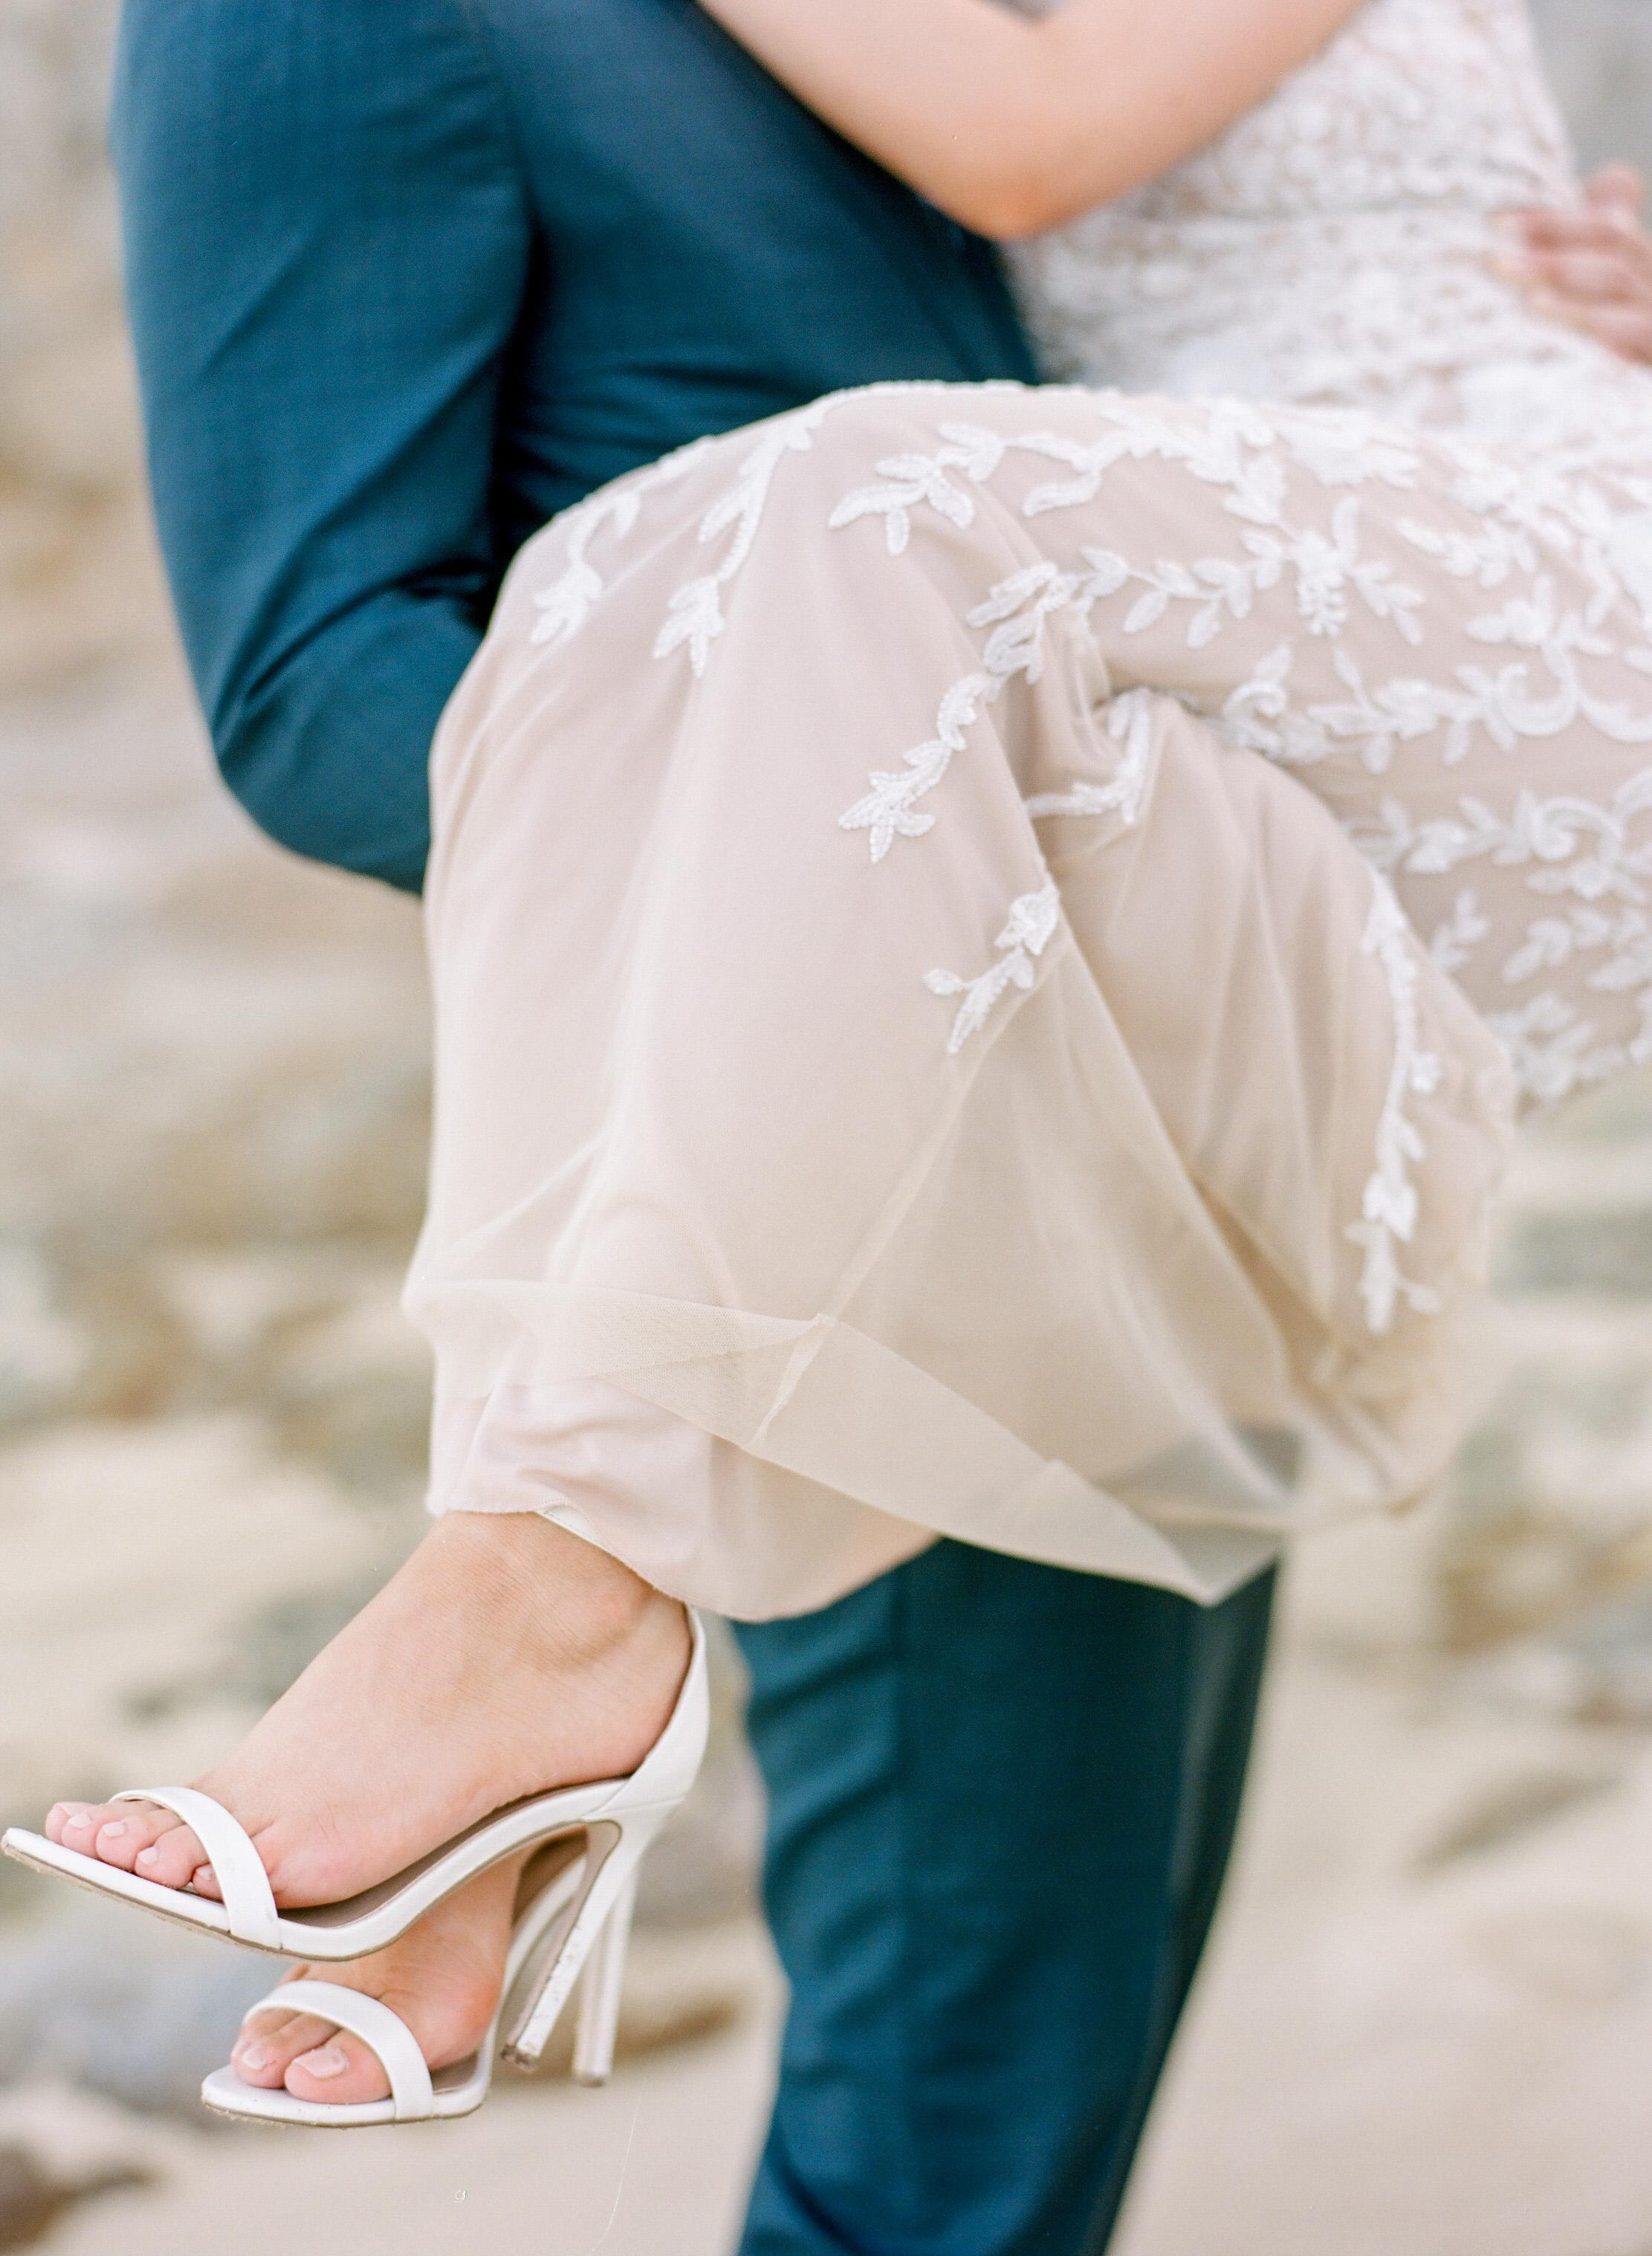 Dana-Fernandez-Photography-Destination-Wedding-Photographer-Cabo-San-Lucas-Film-Houston-Texas-Cabo-13.jpg